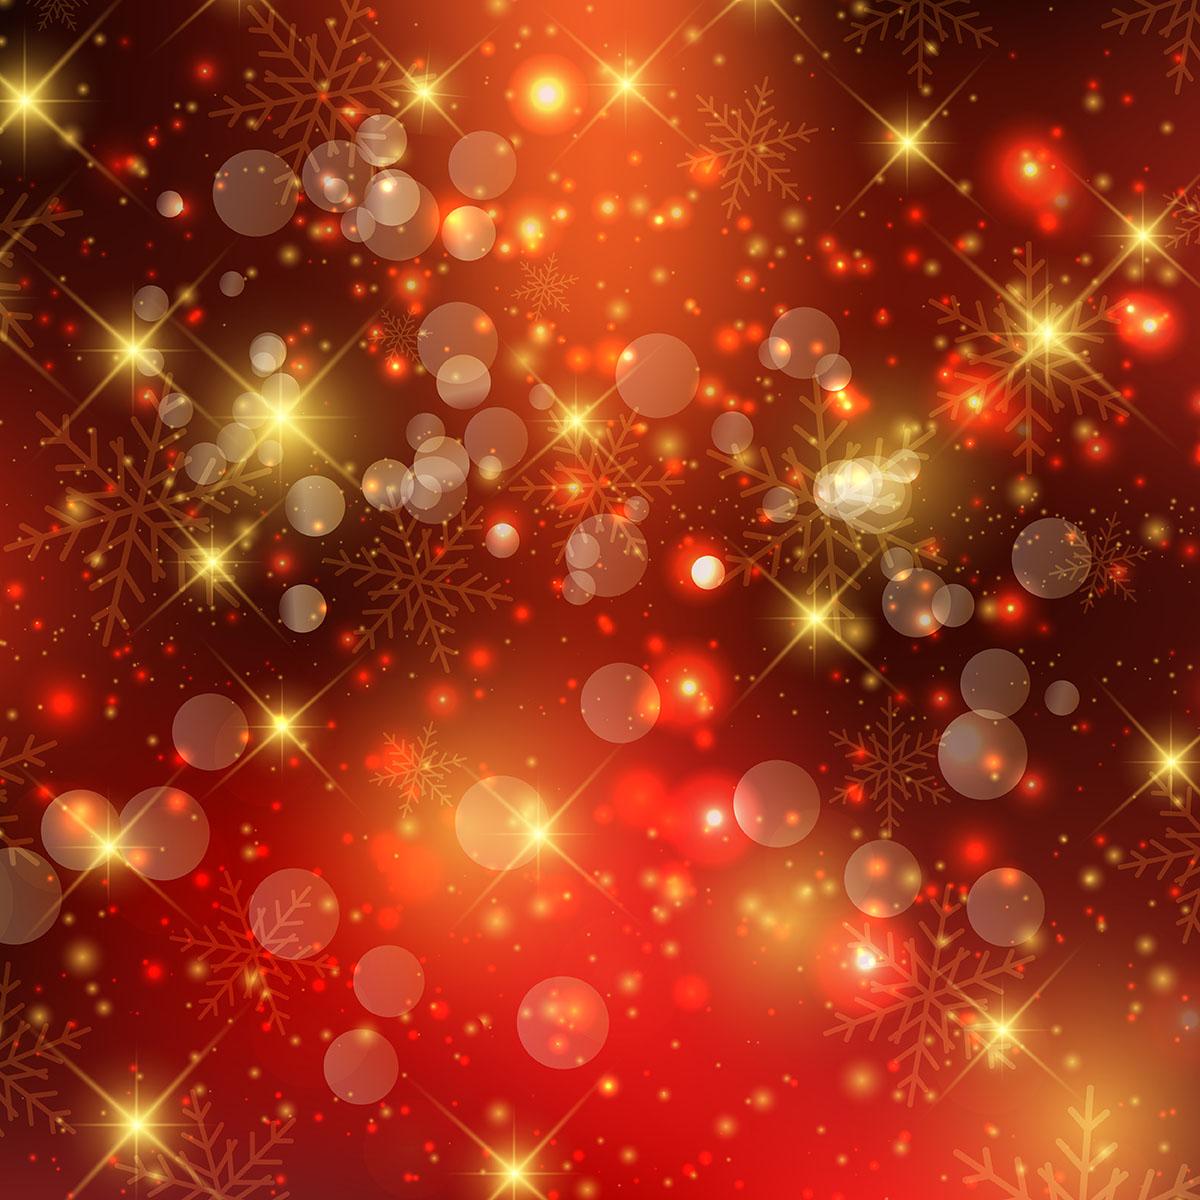 Christmas Lights Border Free Vector Art 204 Free Downloads